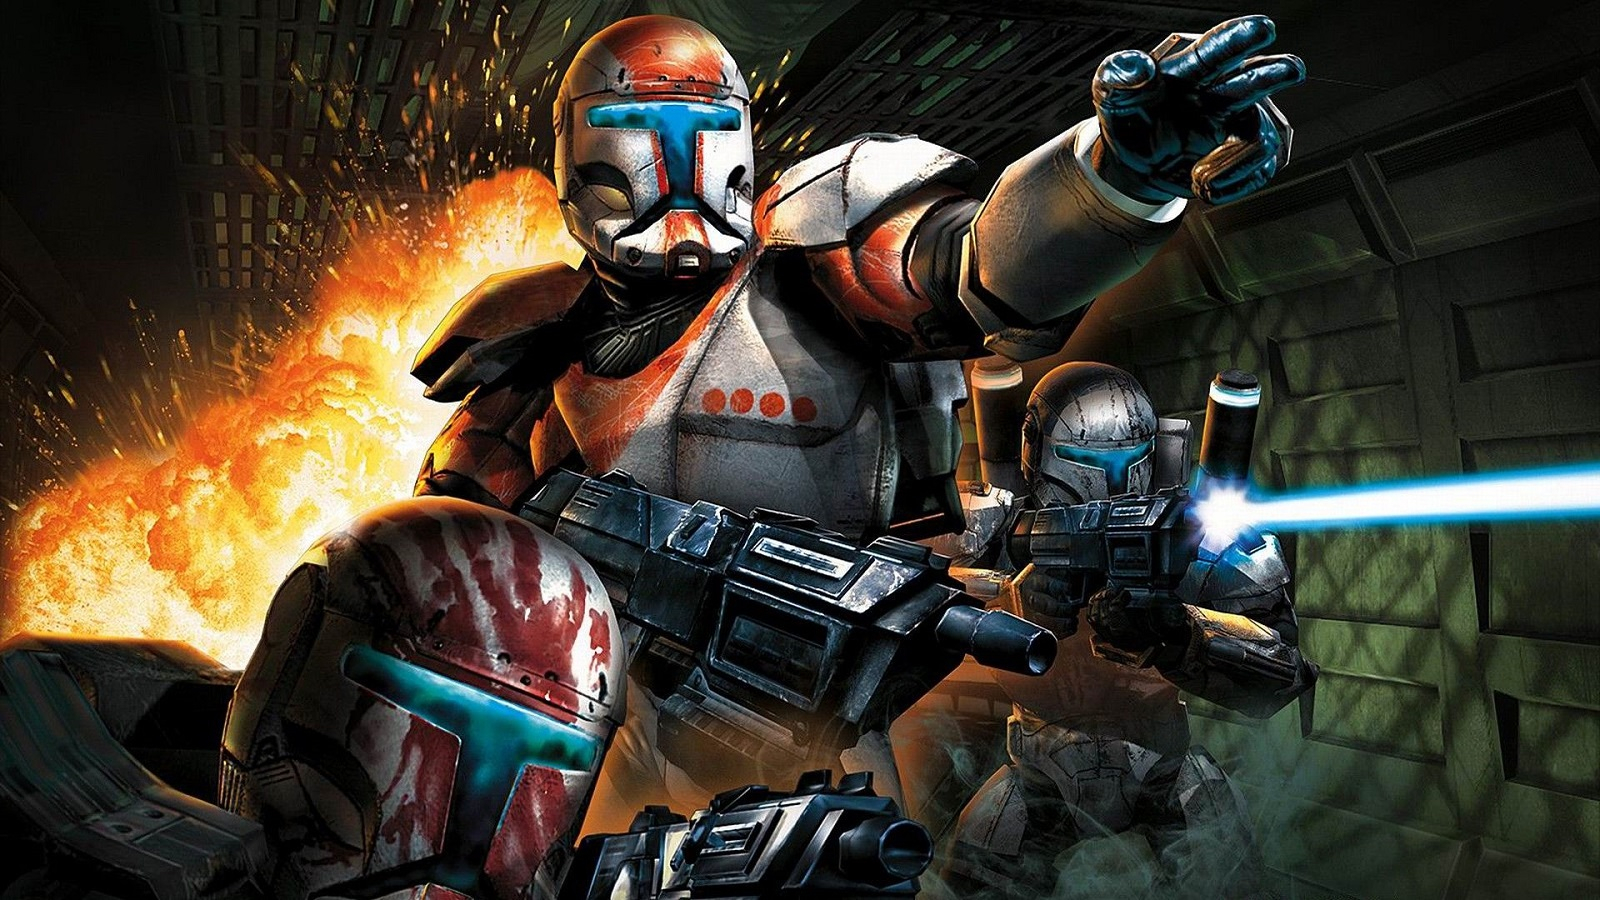 Утечка: тактический шутер Star Wars: Republic Commando получит переиздание как минимум на Switch